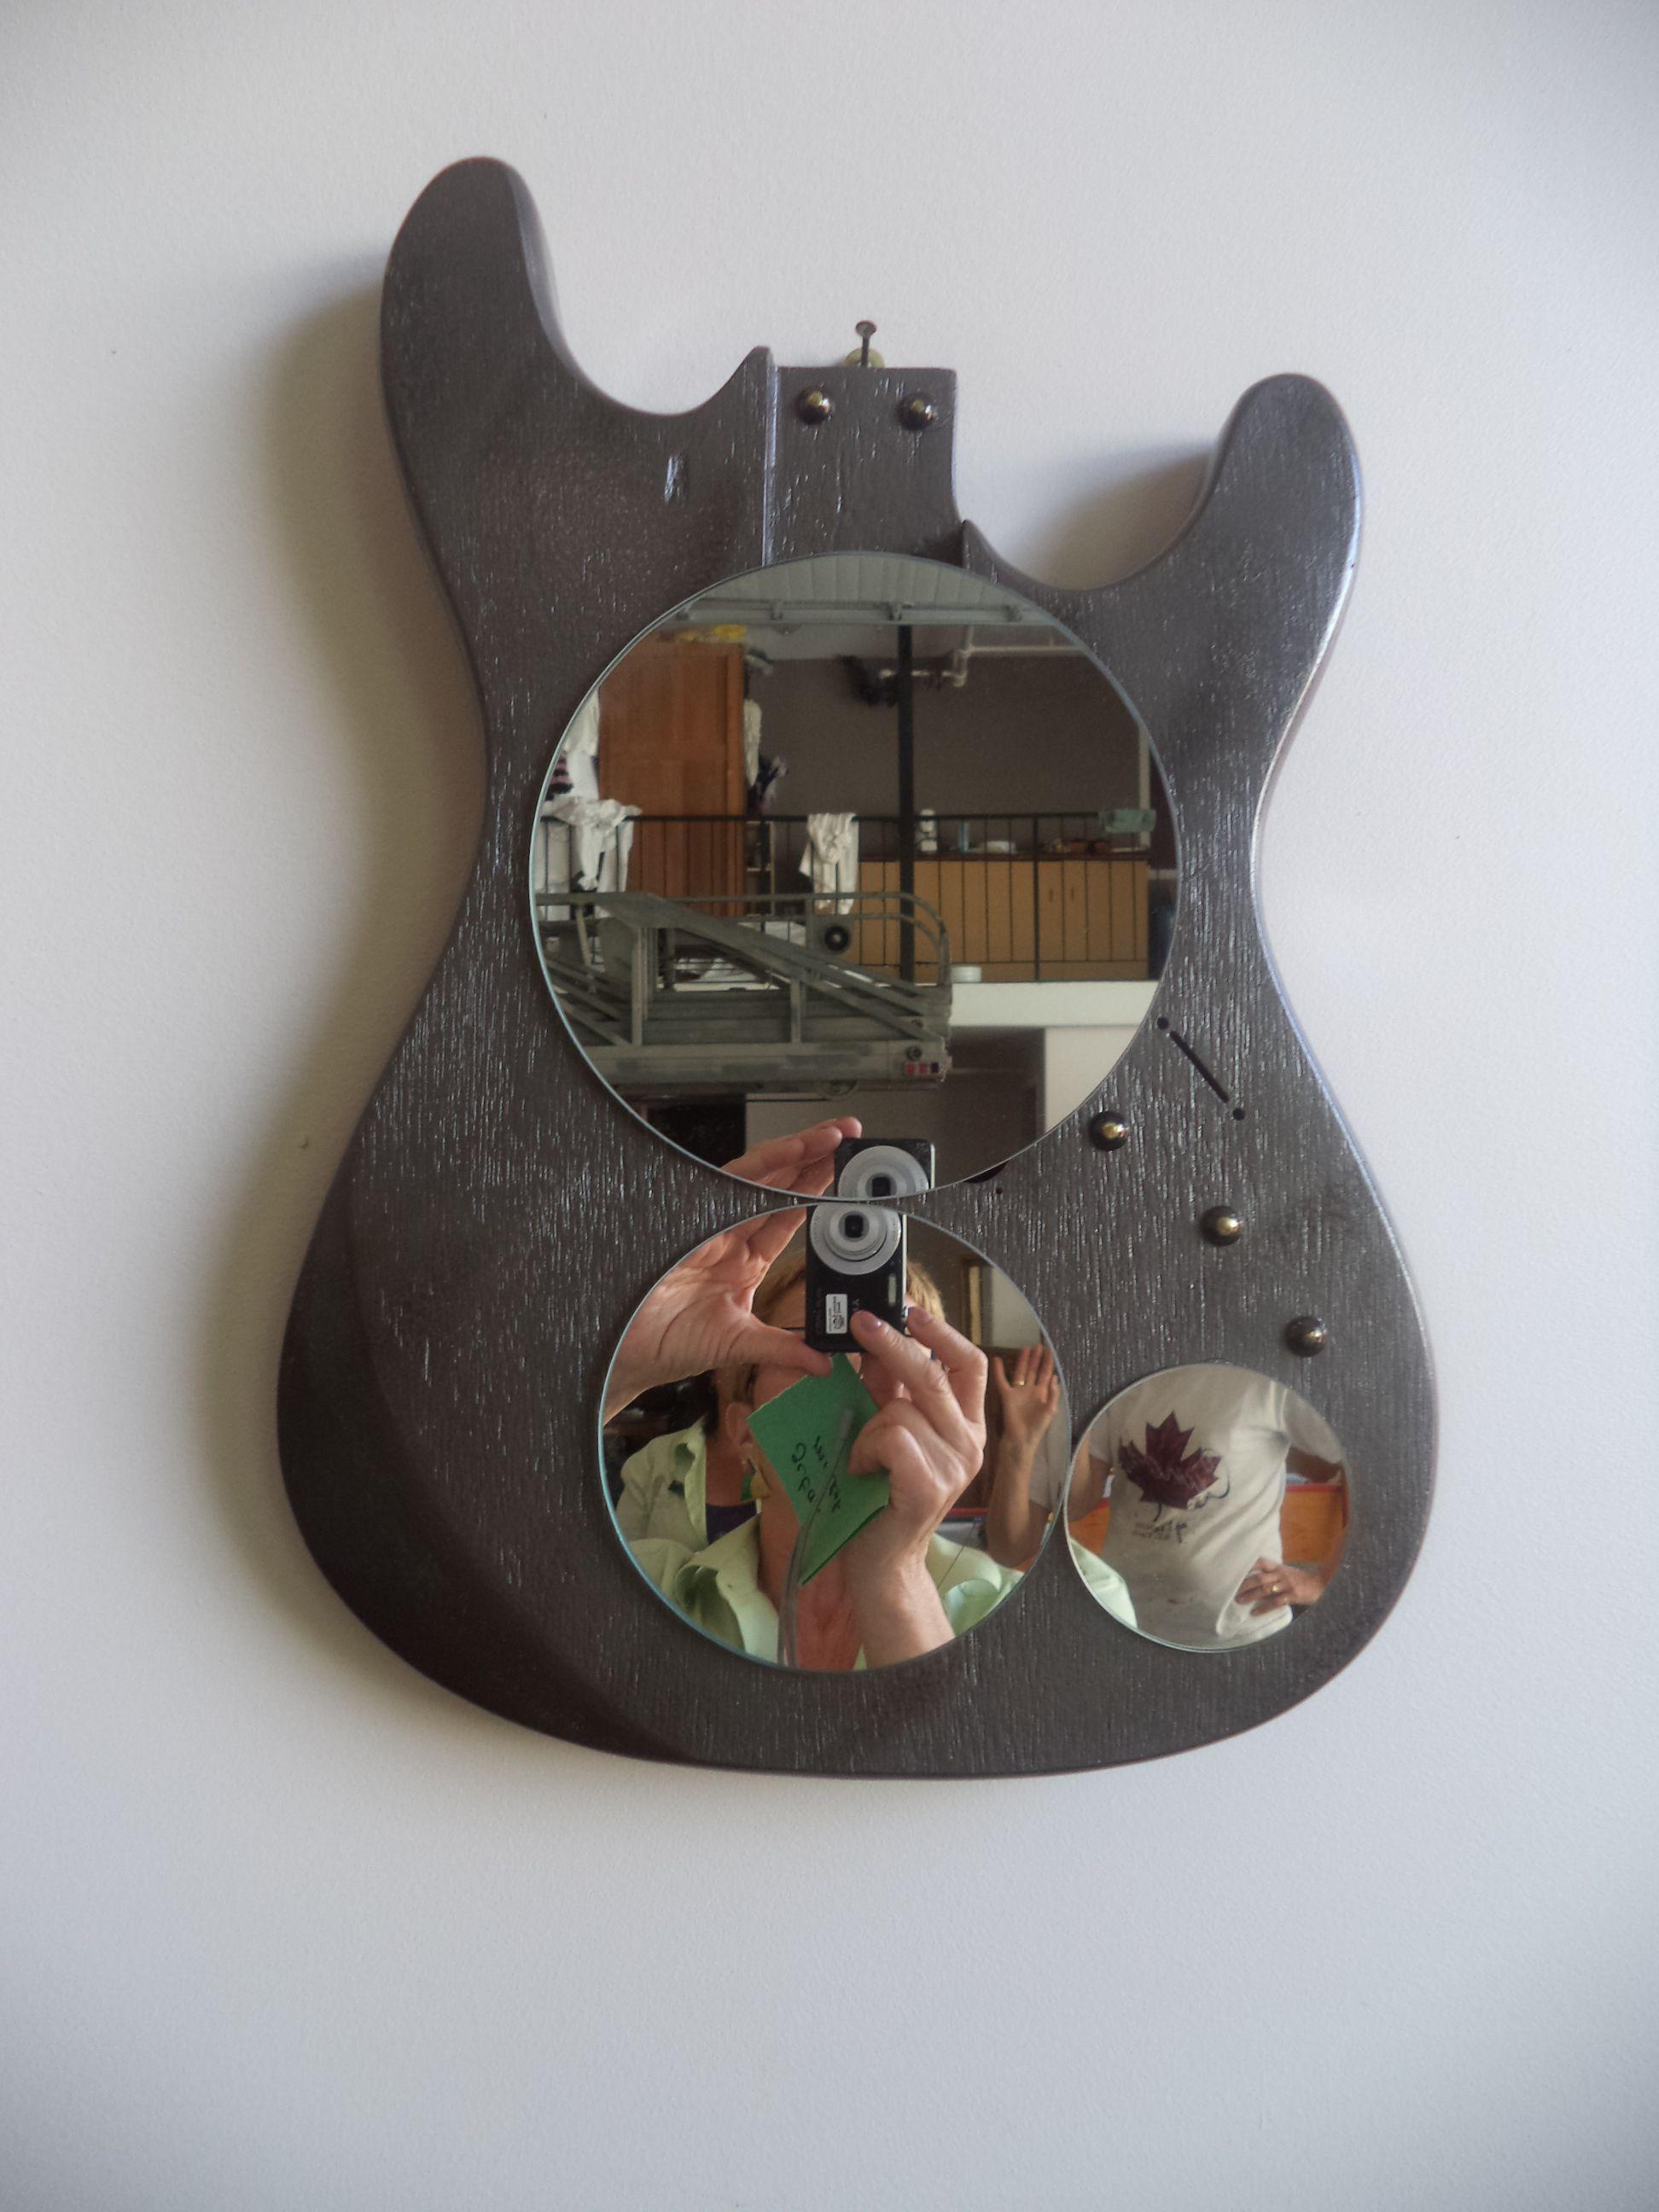 Guitar Art Very Cool Idea If You Have A Broken Guitar Lying Around Skull Wall Decor Large Wall Clock Decor Washi Tape Wall Decor